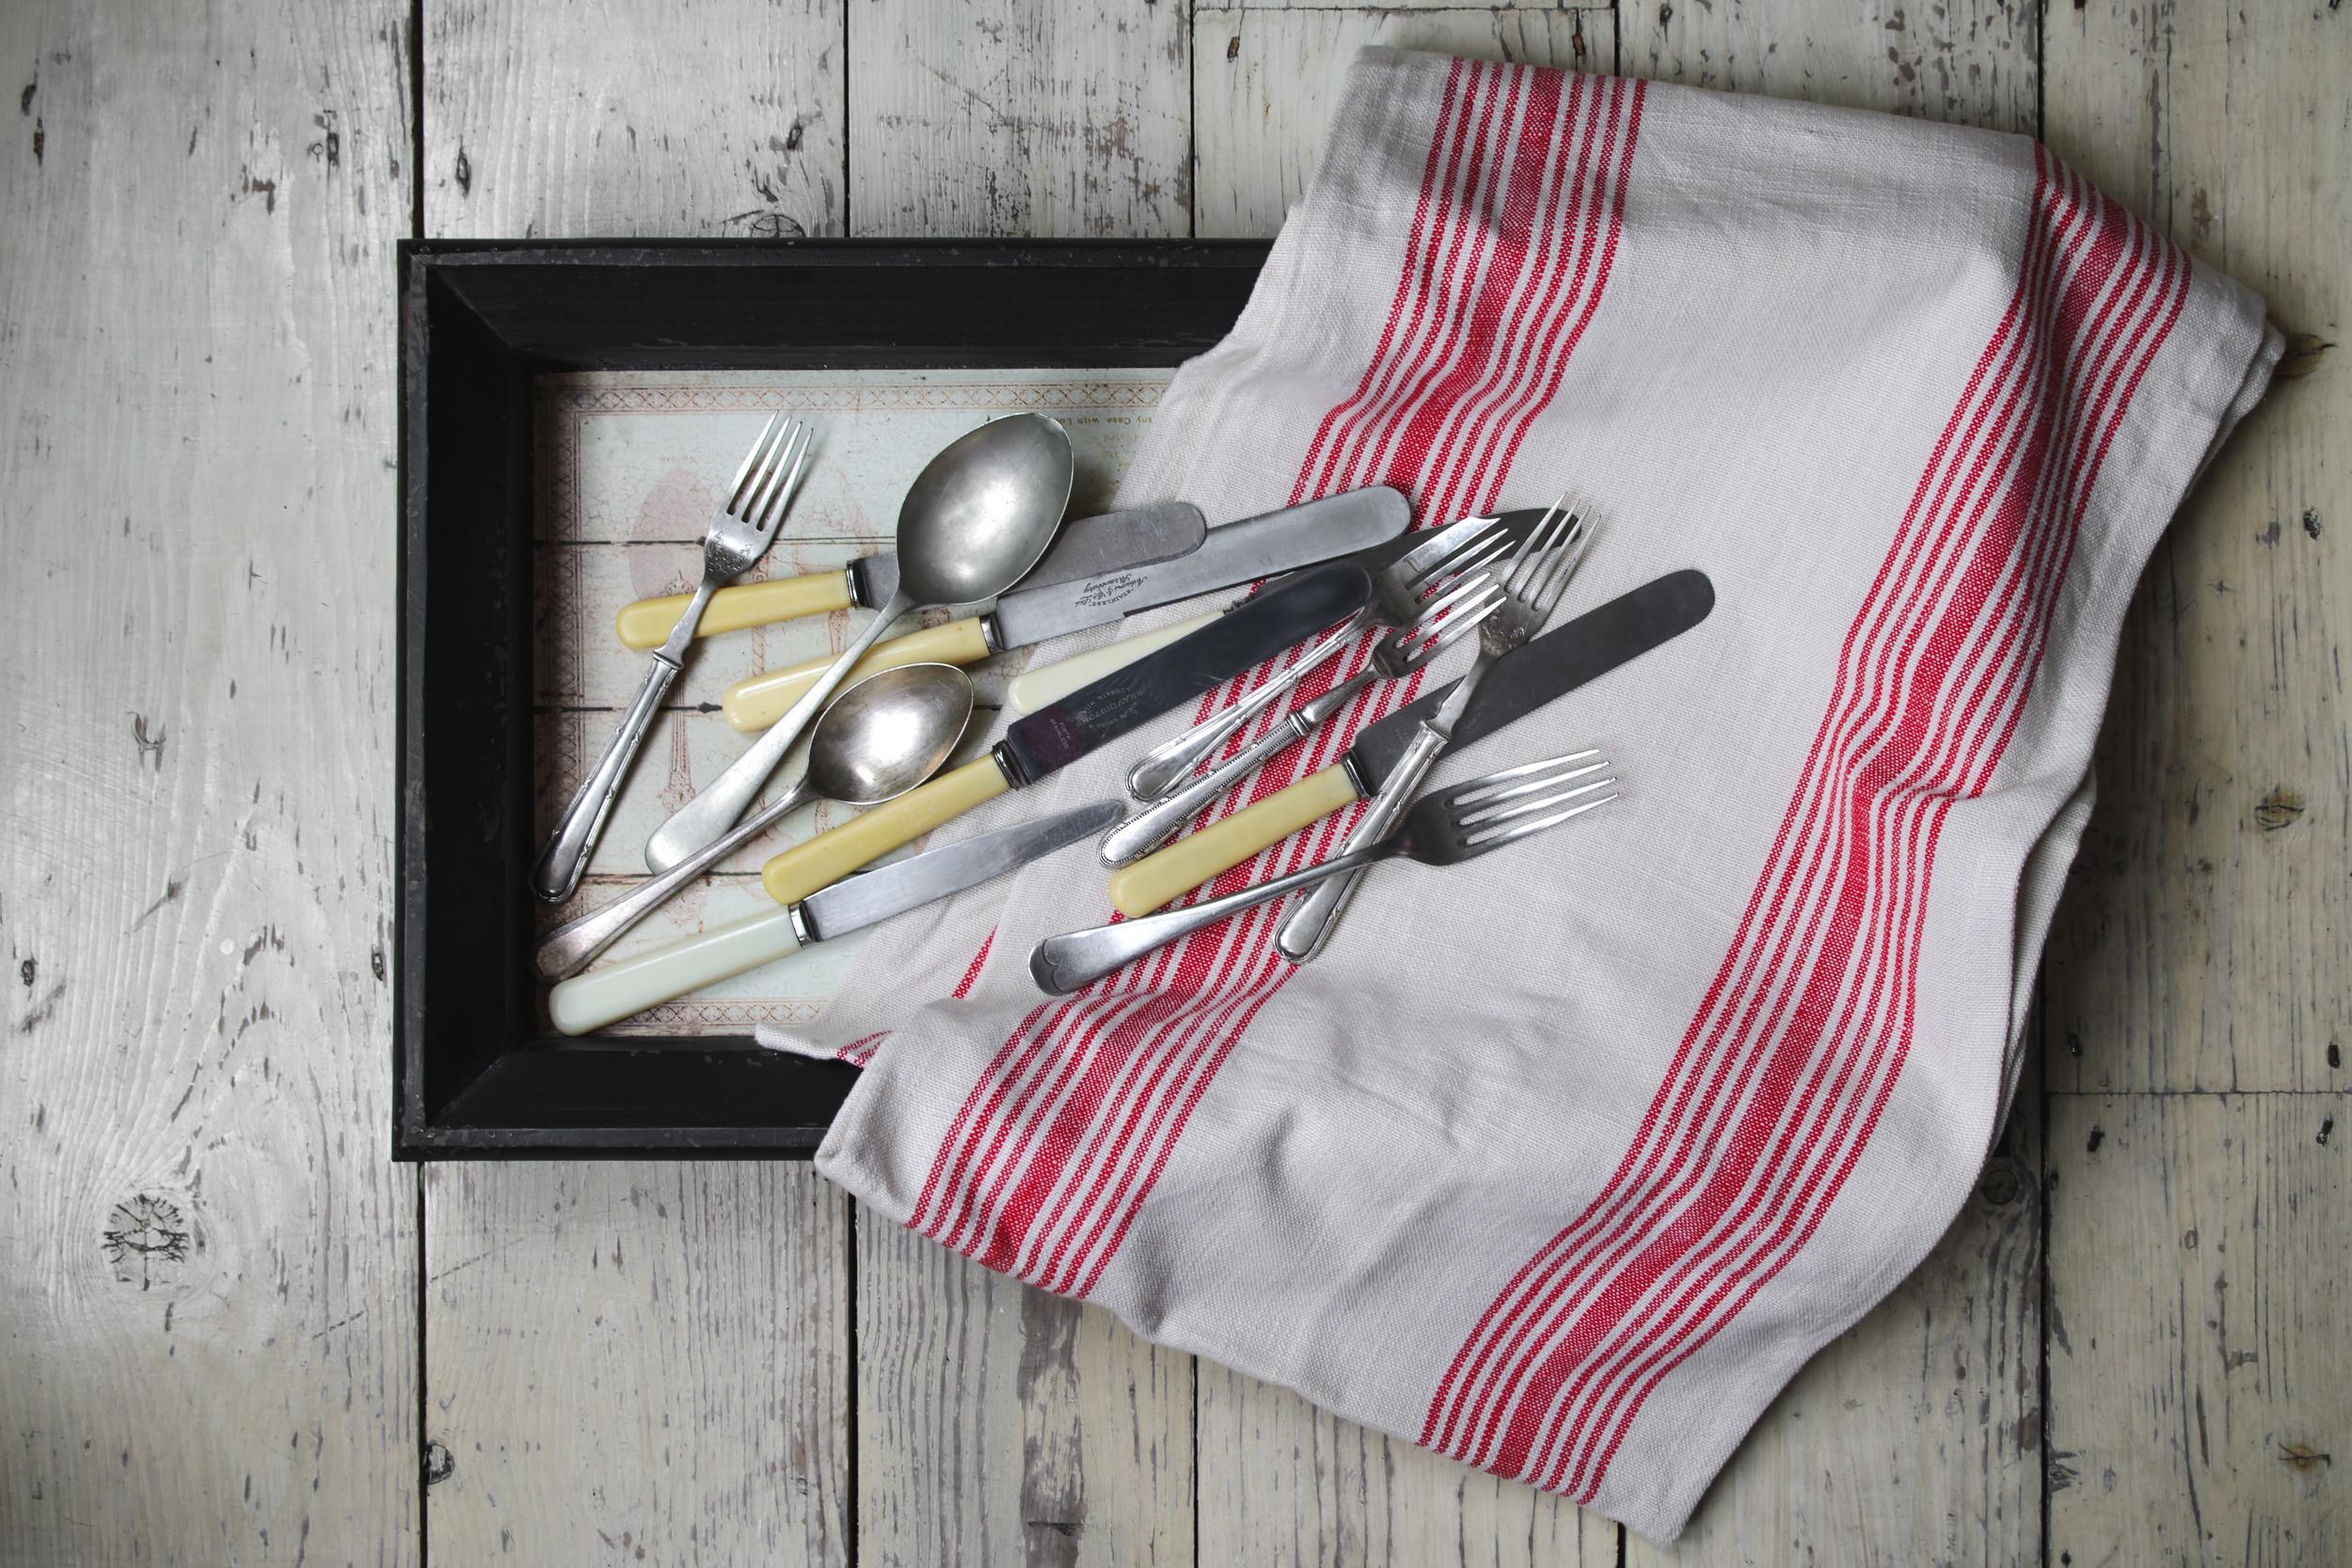 Cutlery_1.jpg